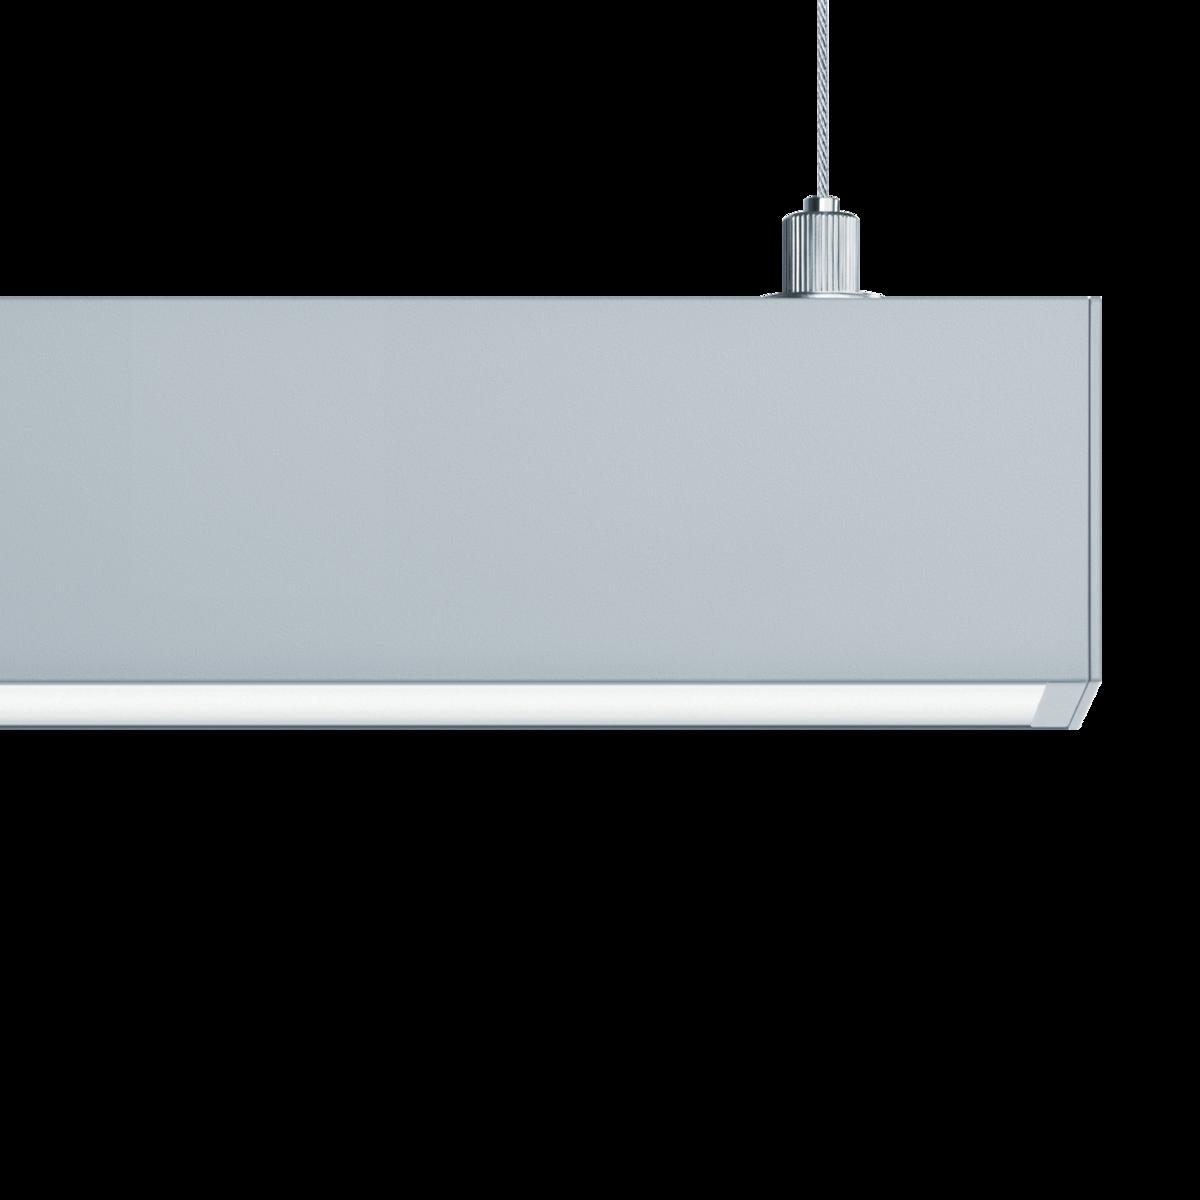 slotlight led ii pendant 2 5 zumtobel. Black Bedroom Furniture Sets. Home Design Ideas